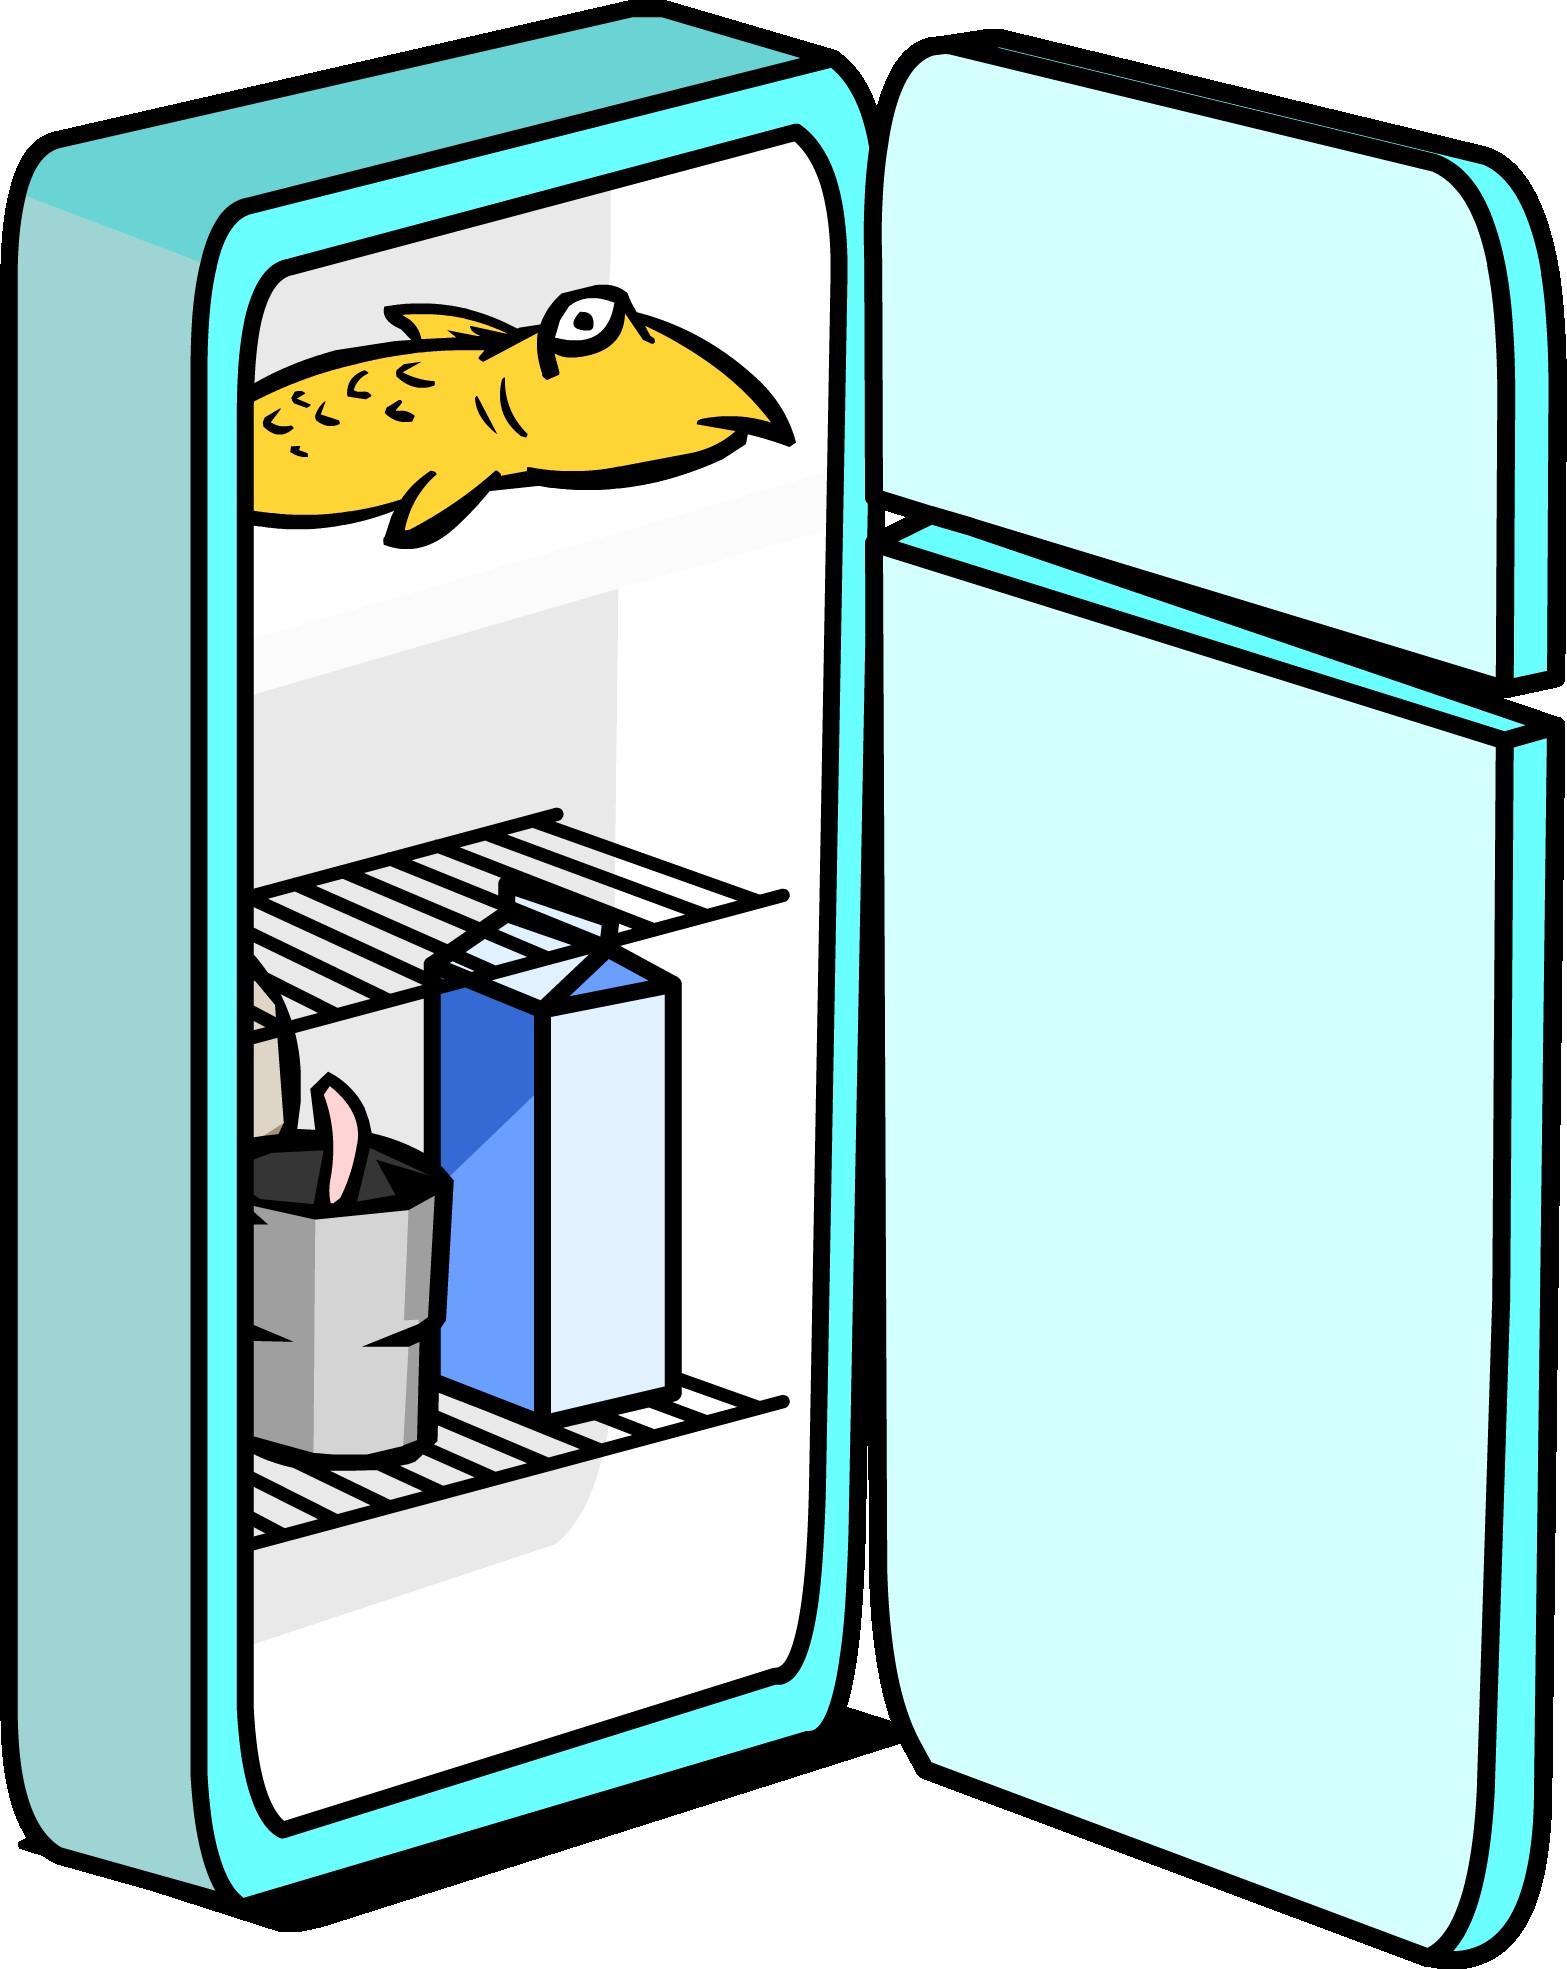 Refrigerator Drawings.